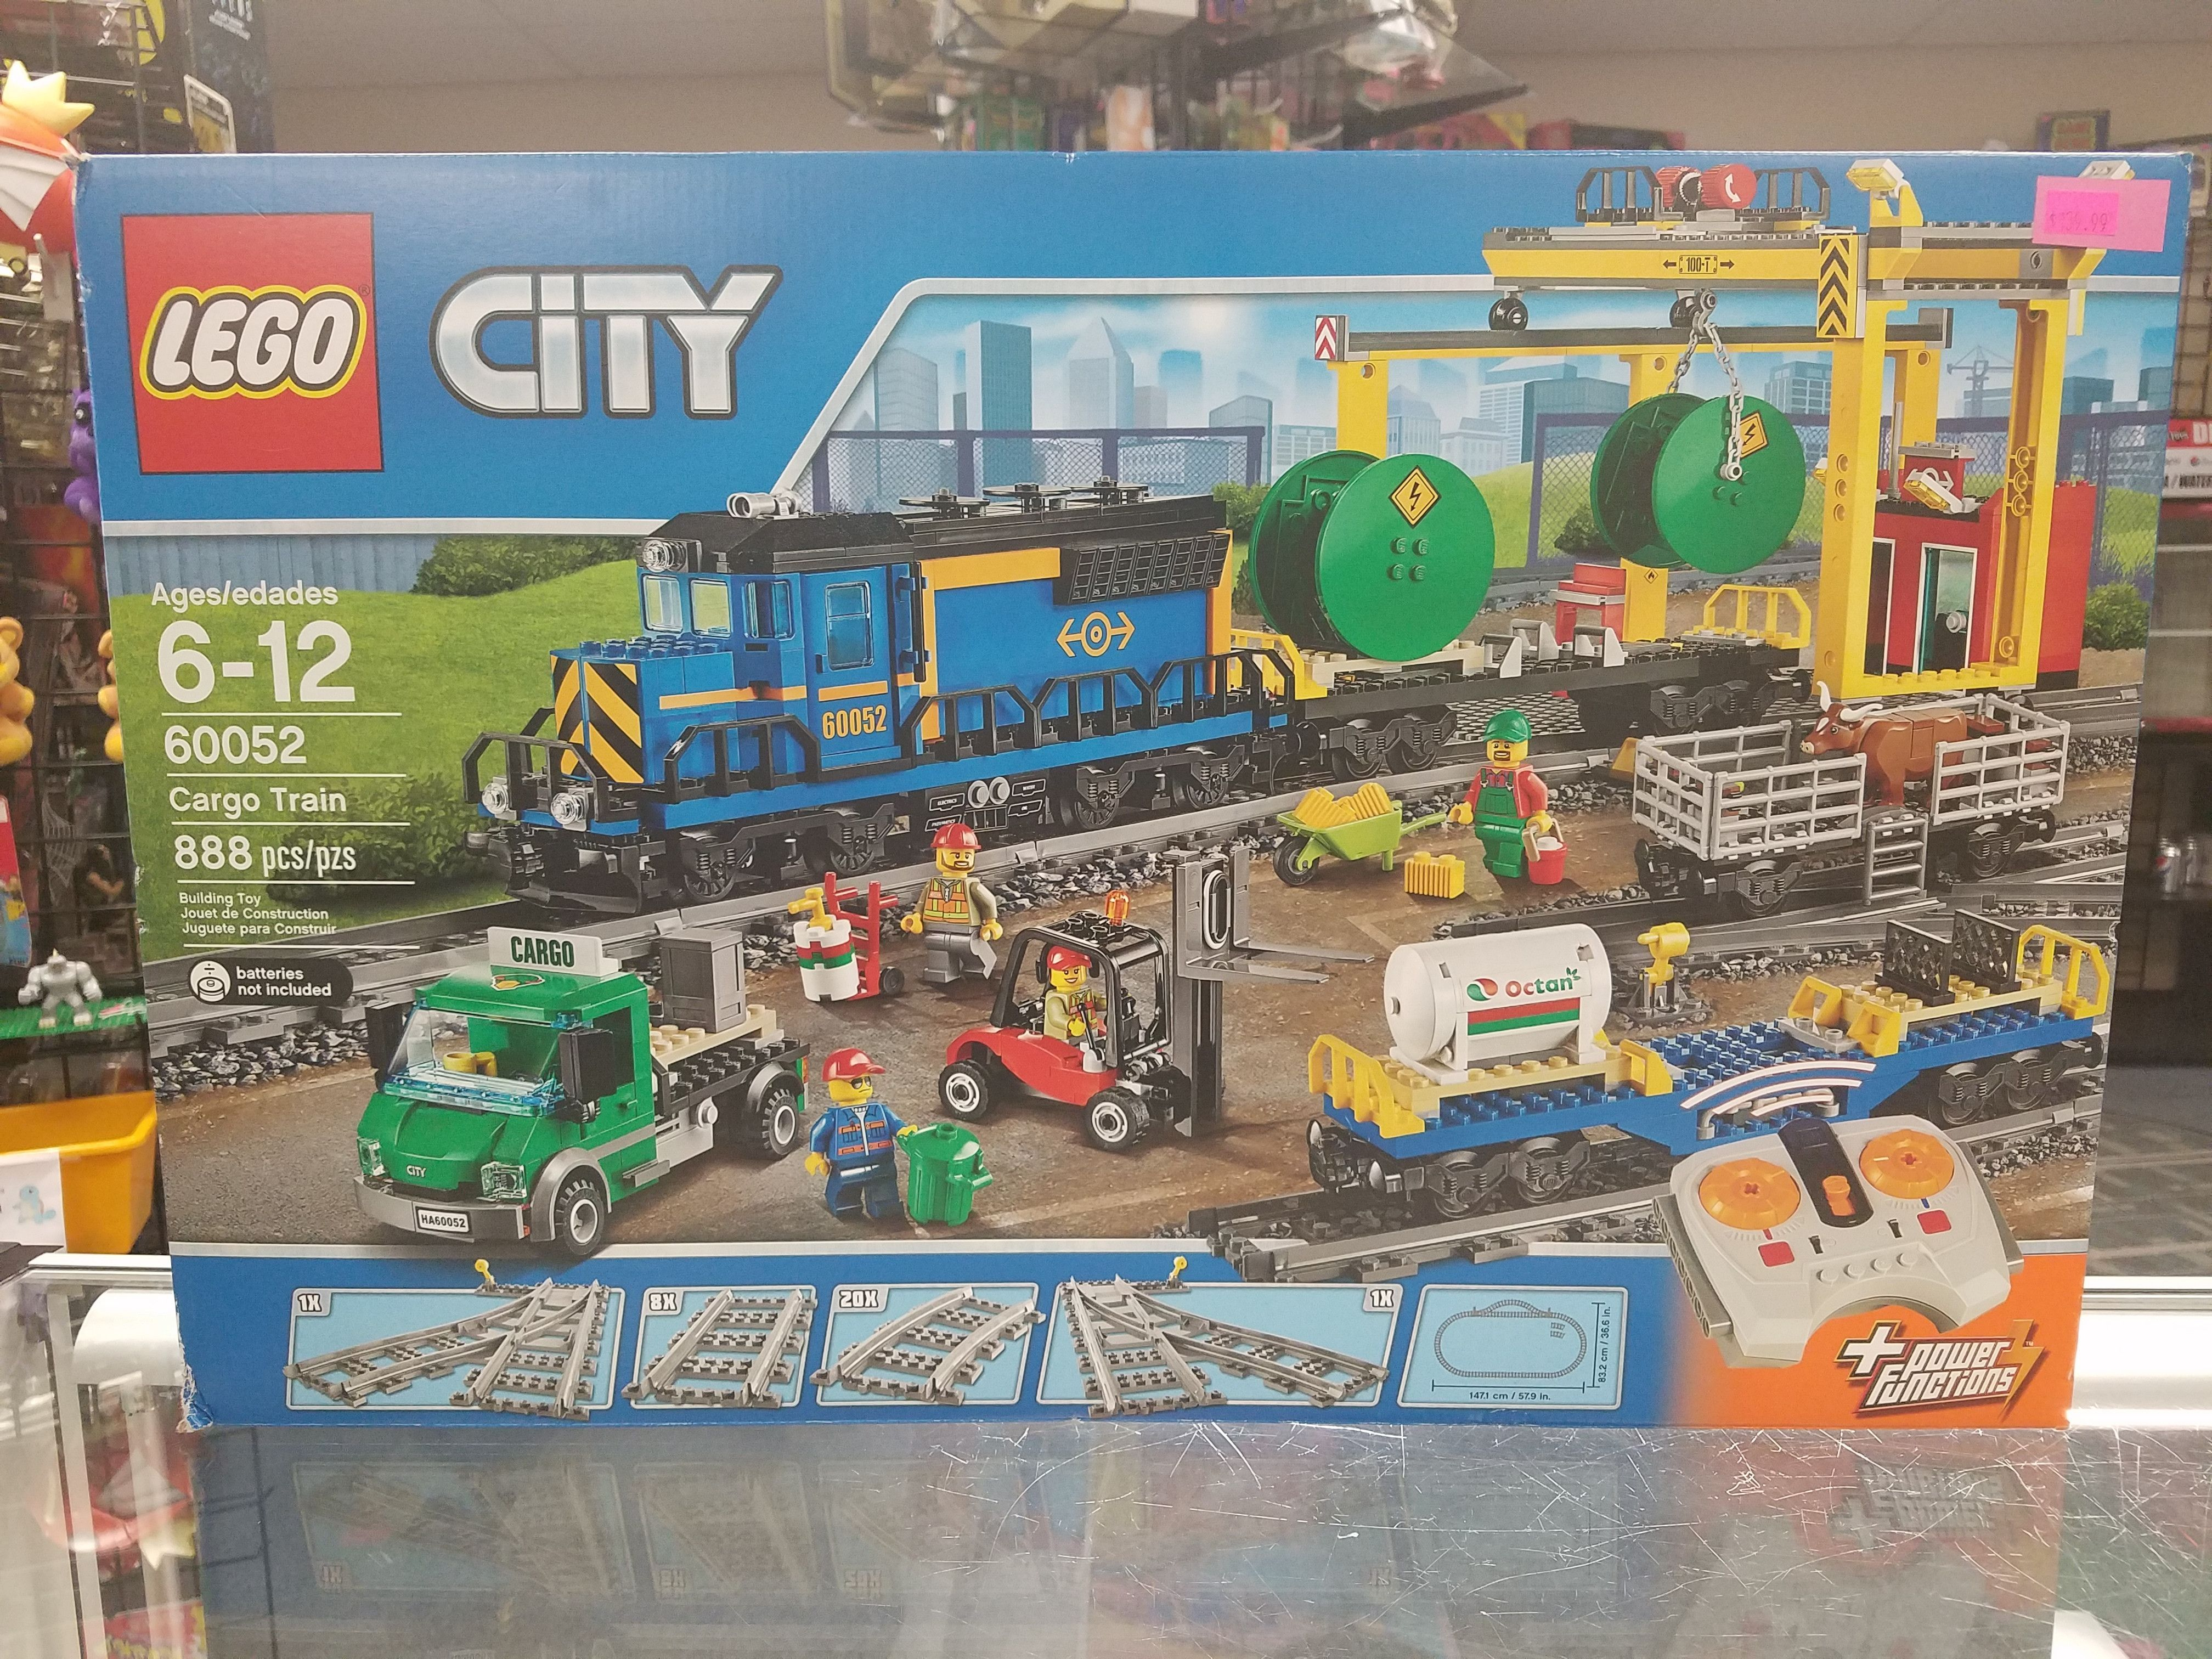 Jual Cargo Train 60052 Termurah 2018 Produk Ukm Bumn Rc Super Power Truck Type 2 Lego City Set Functions